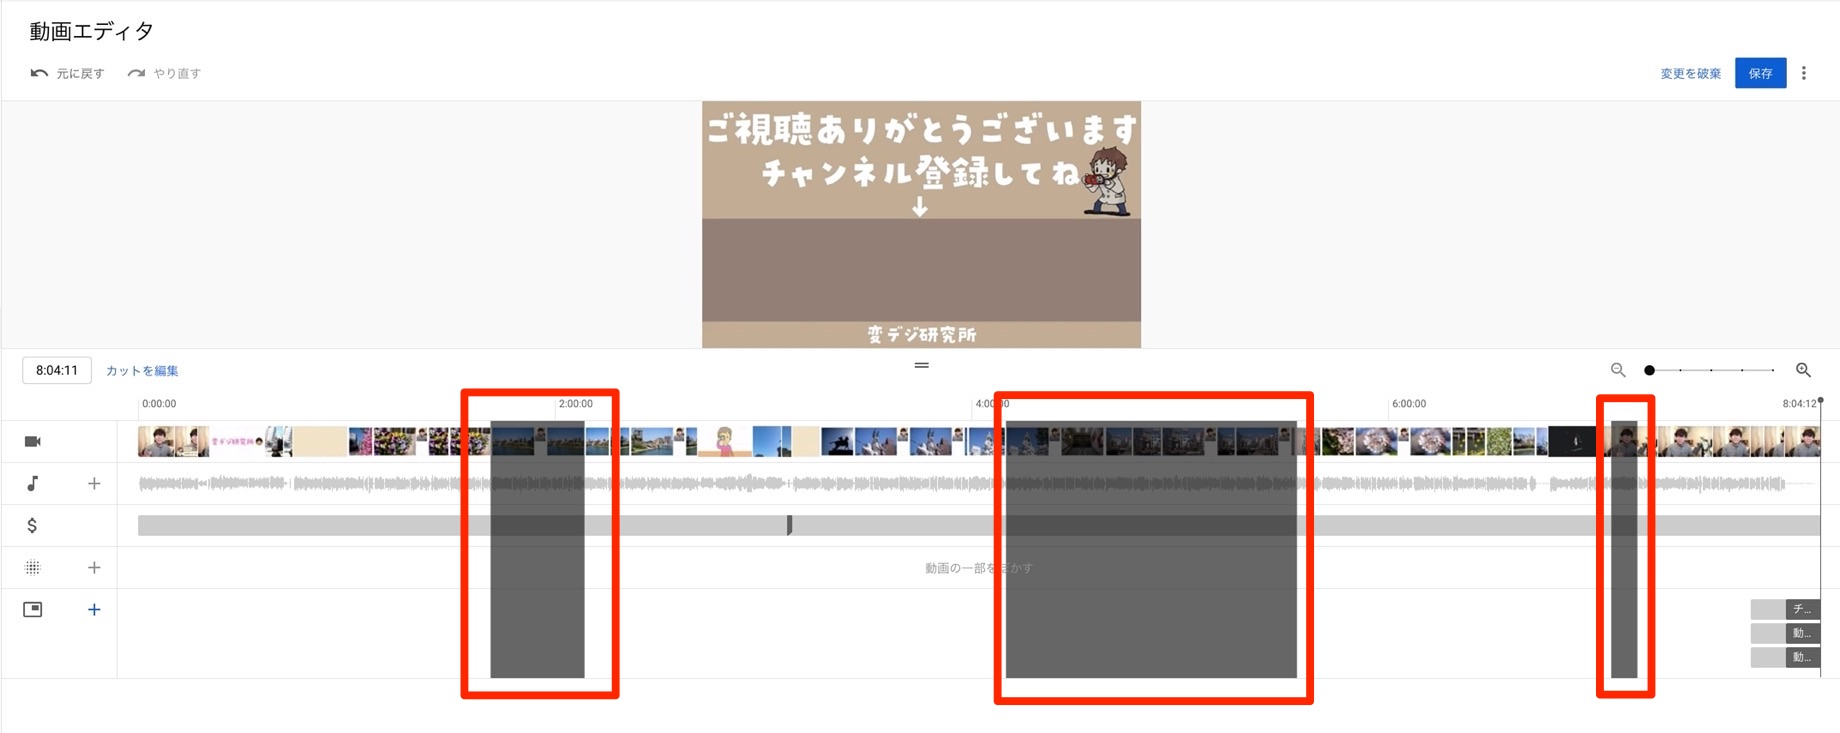 YouTube Studio カット 複数